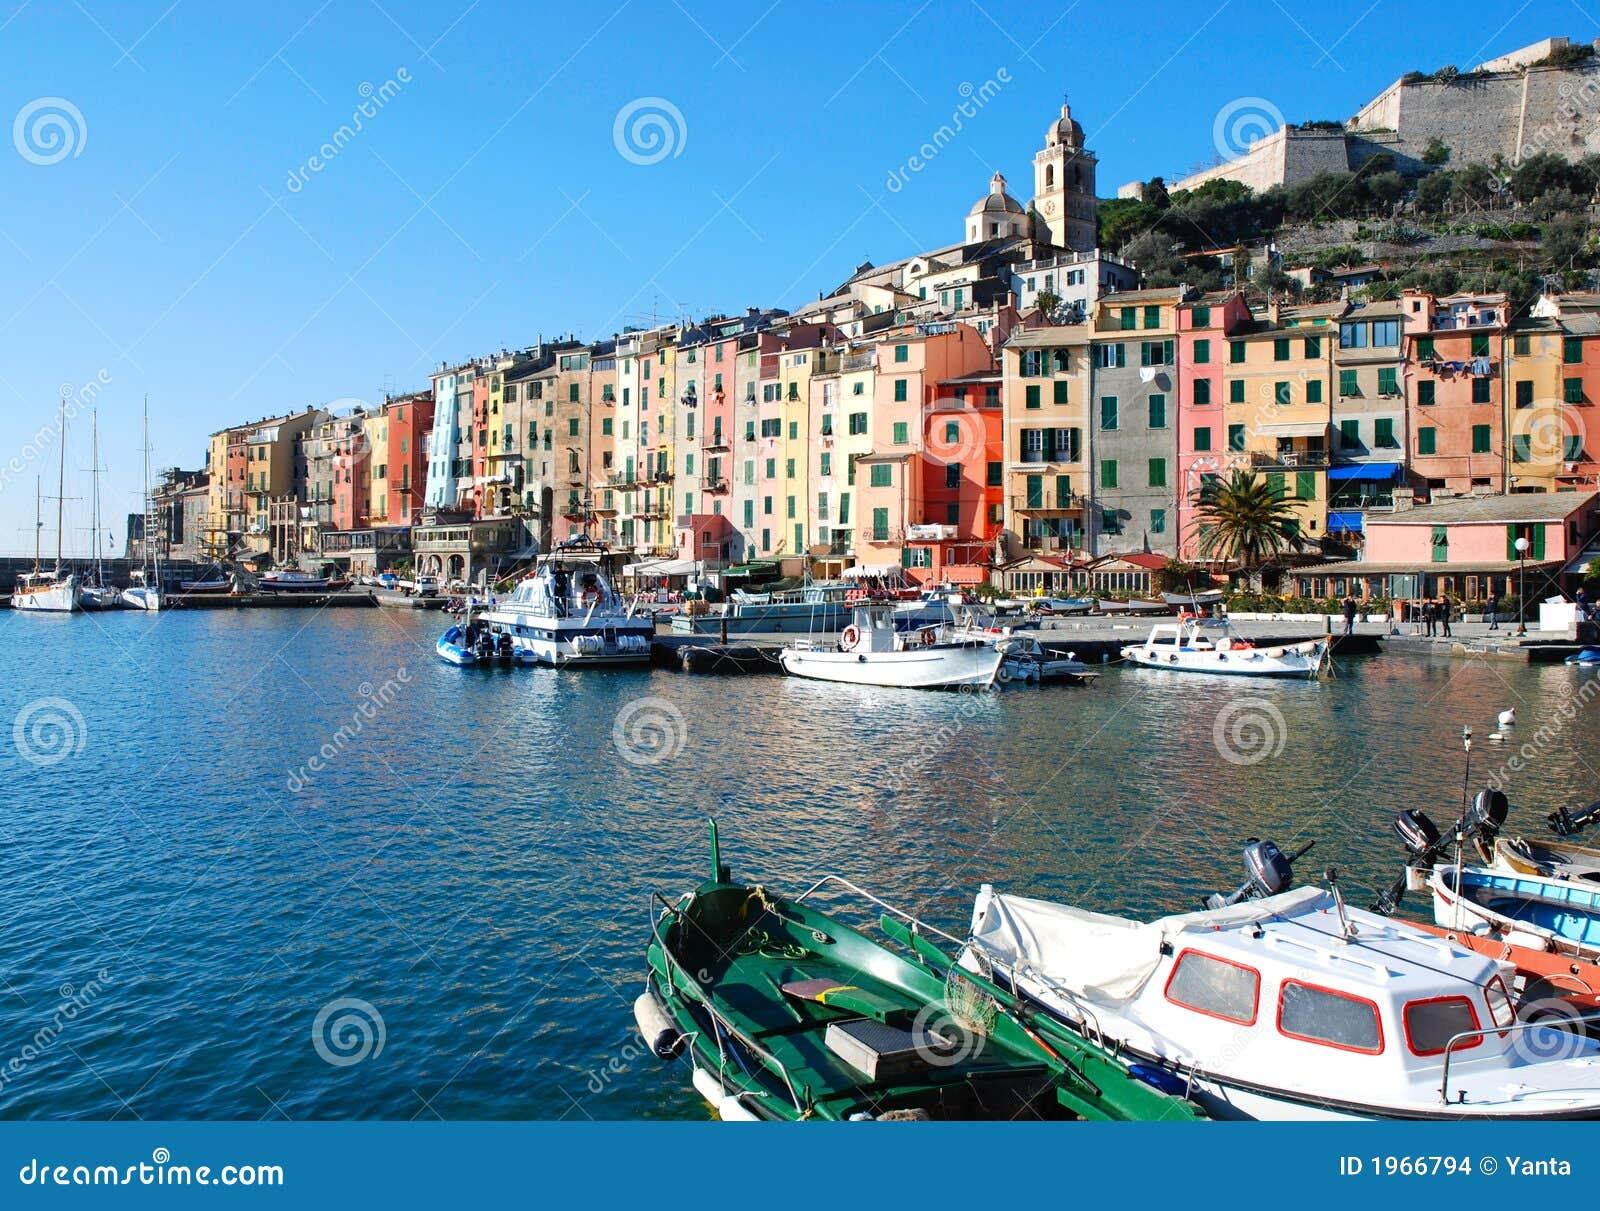 Ville color e d 39 italien de bord de la mer photo stock - Ville bord de mer mediterranee ...